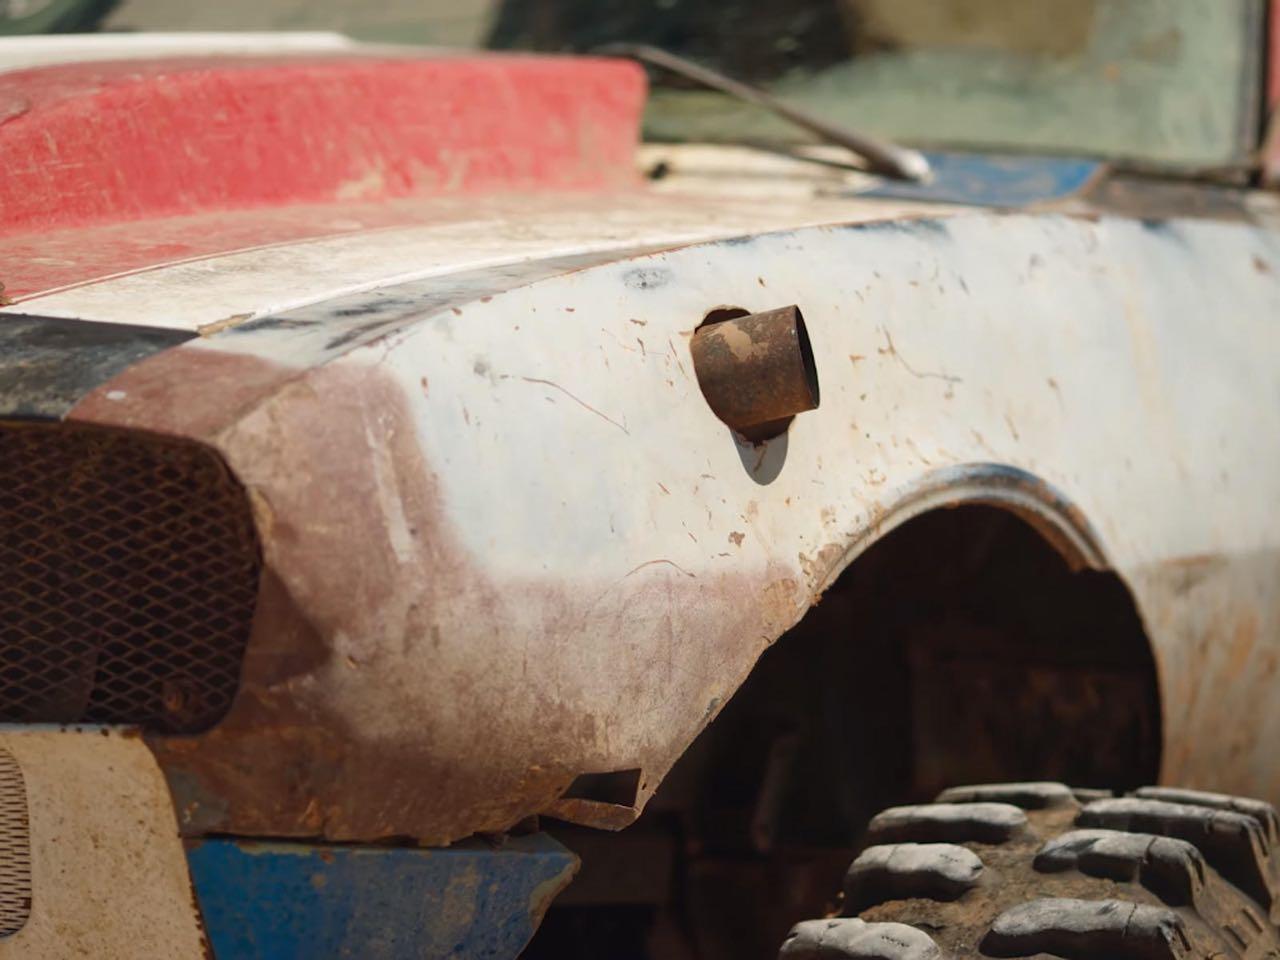 The Mudmaro : La fusion d'un Hummer H1 et d'une Camaro ! 9